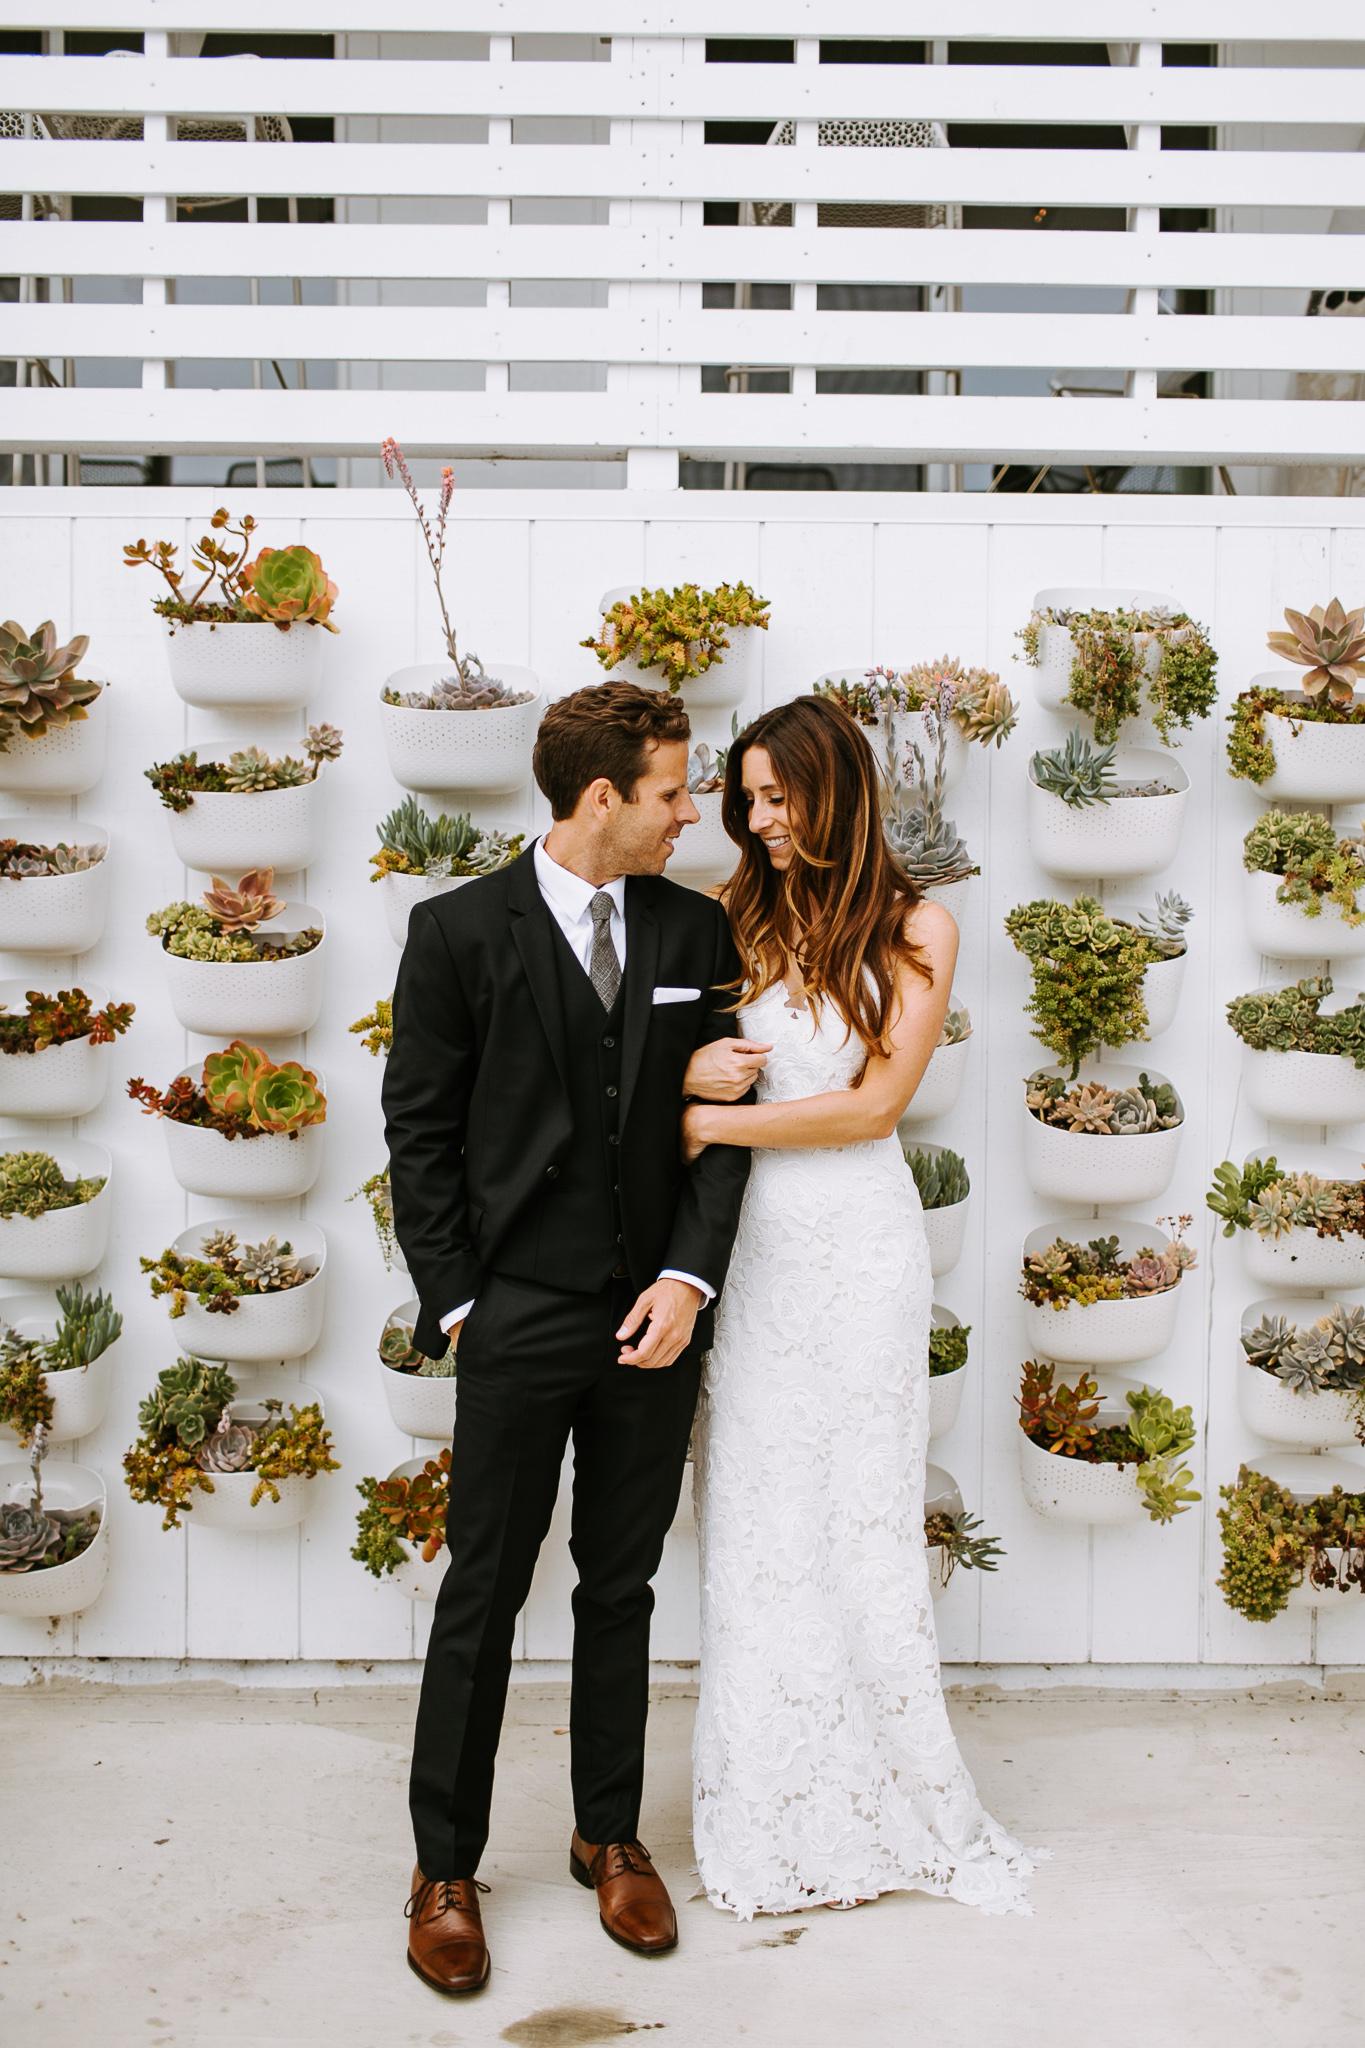 LagunaBeach-WeddingPhotographer-27.jpg